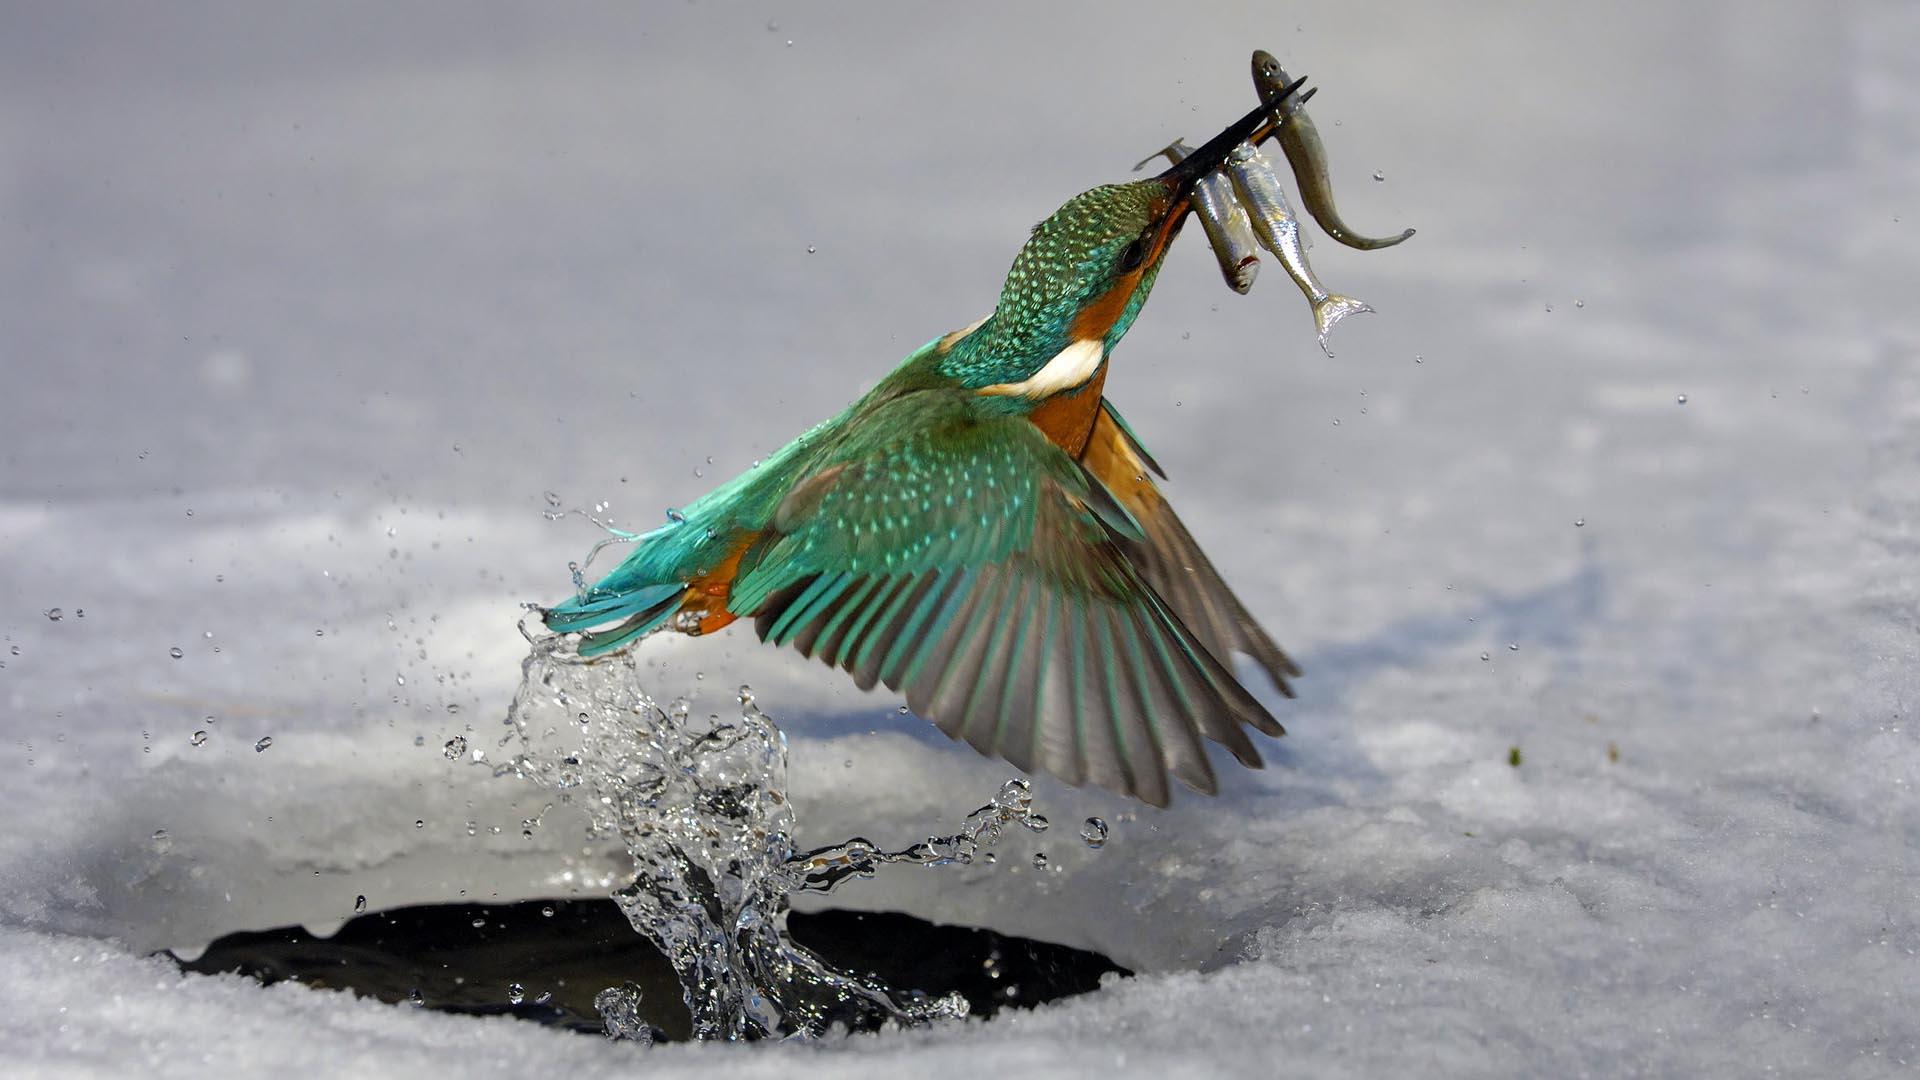 Kingfisher Bird 1080p Hd Wallpaper 1920x1080